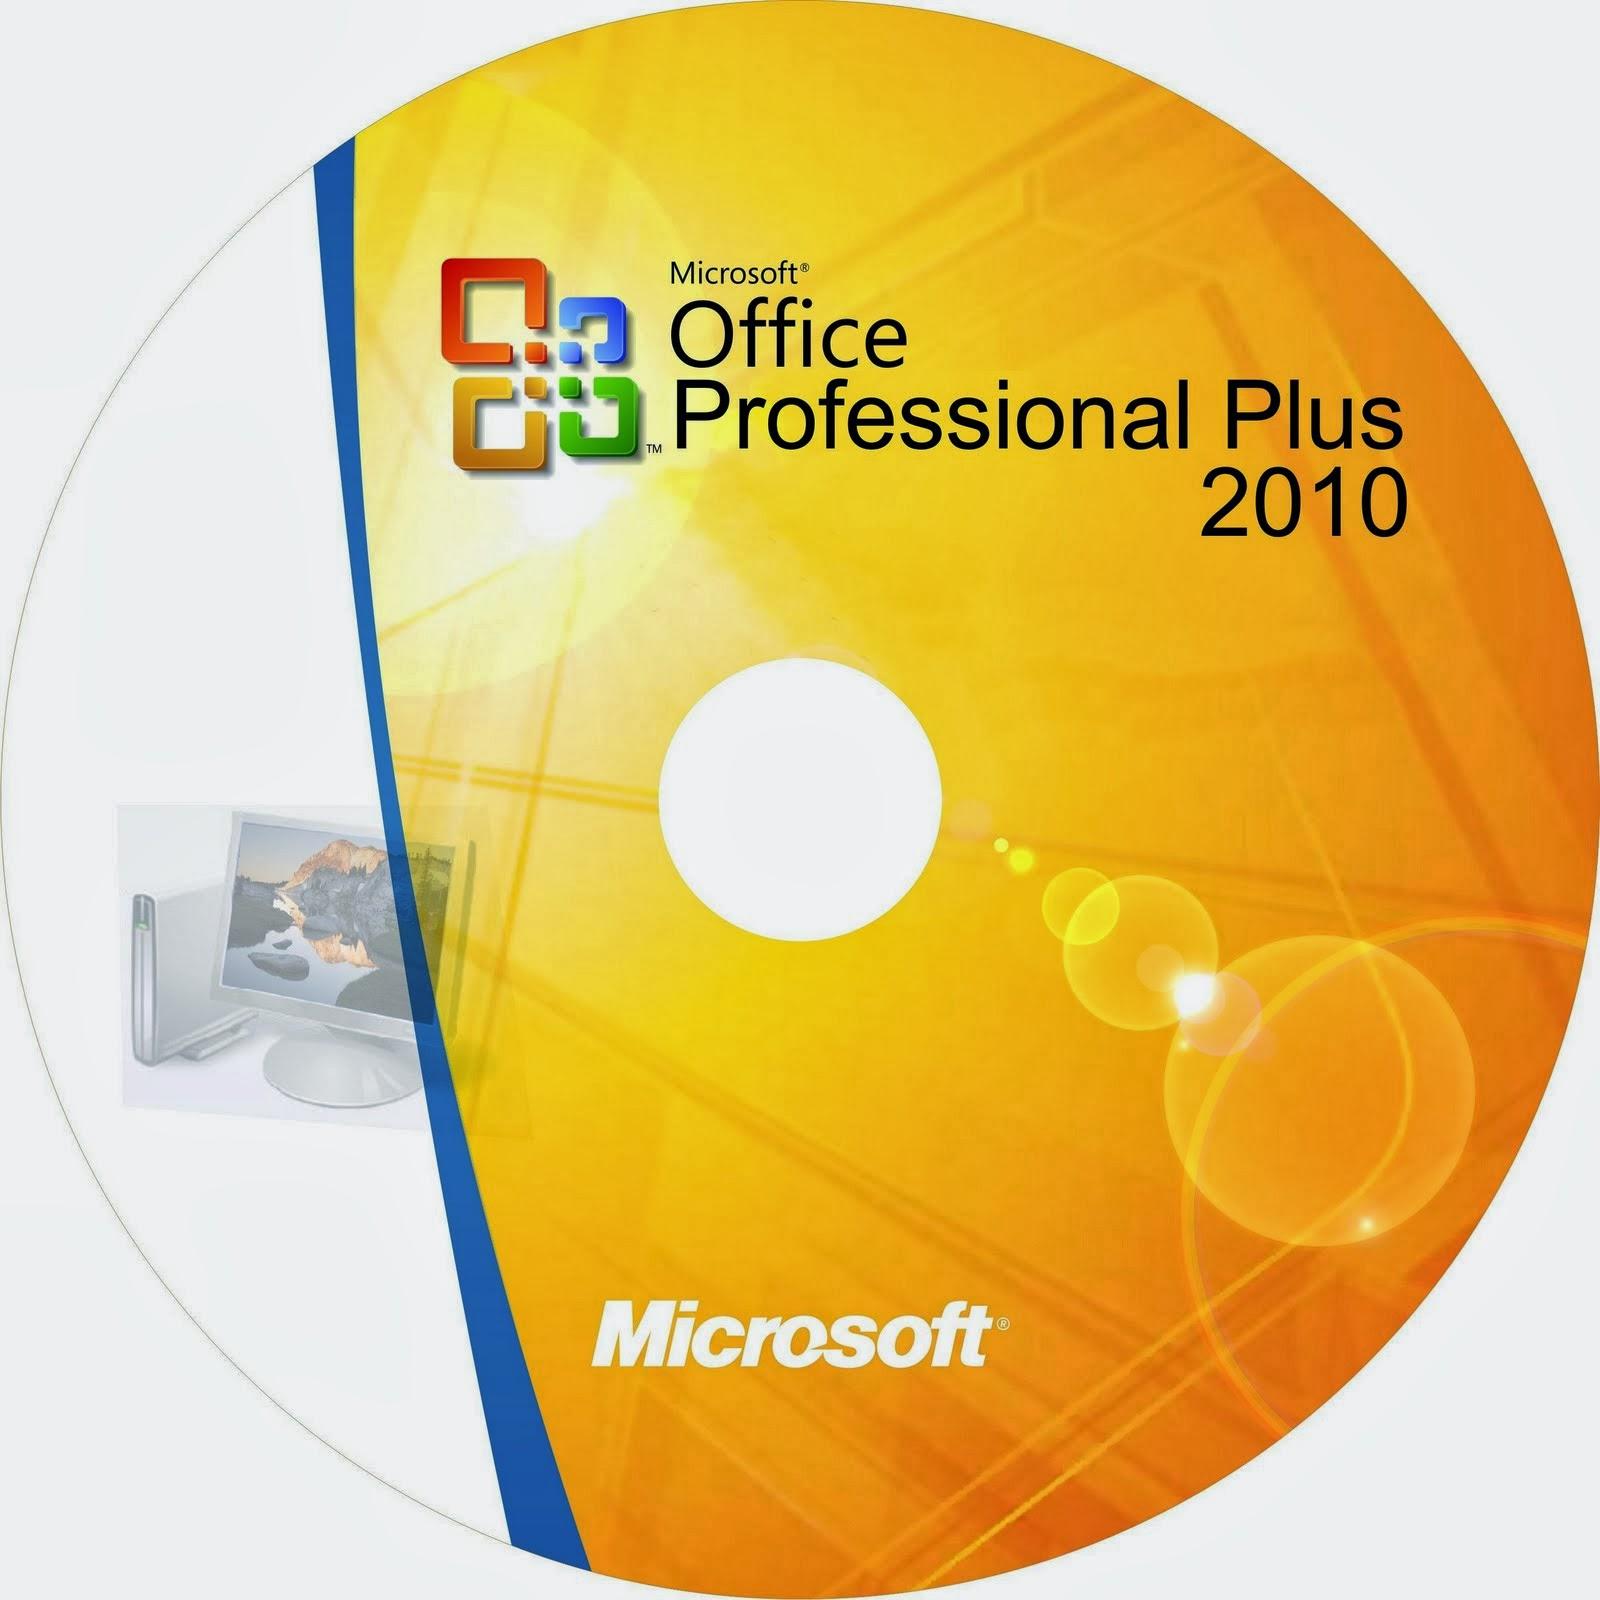 download microsoft office 2010 professional plus 32 bit iso